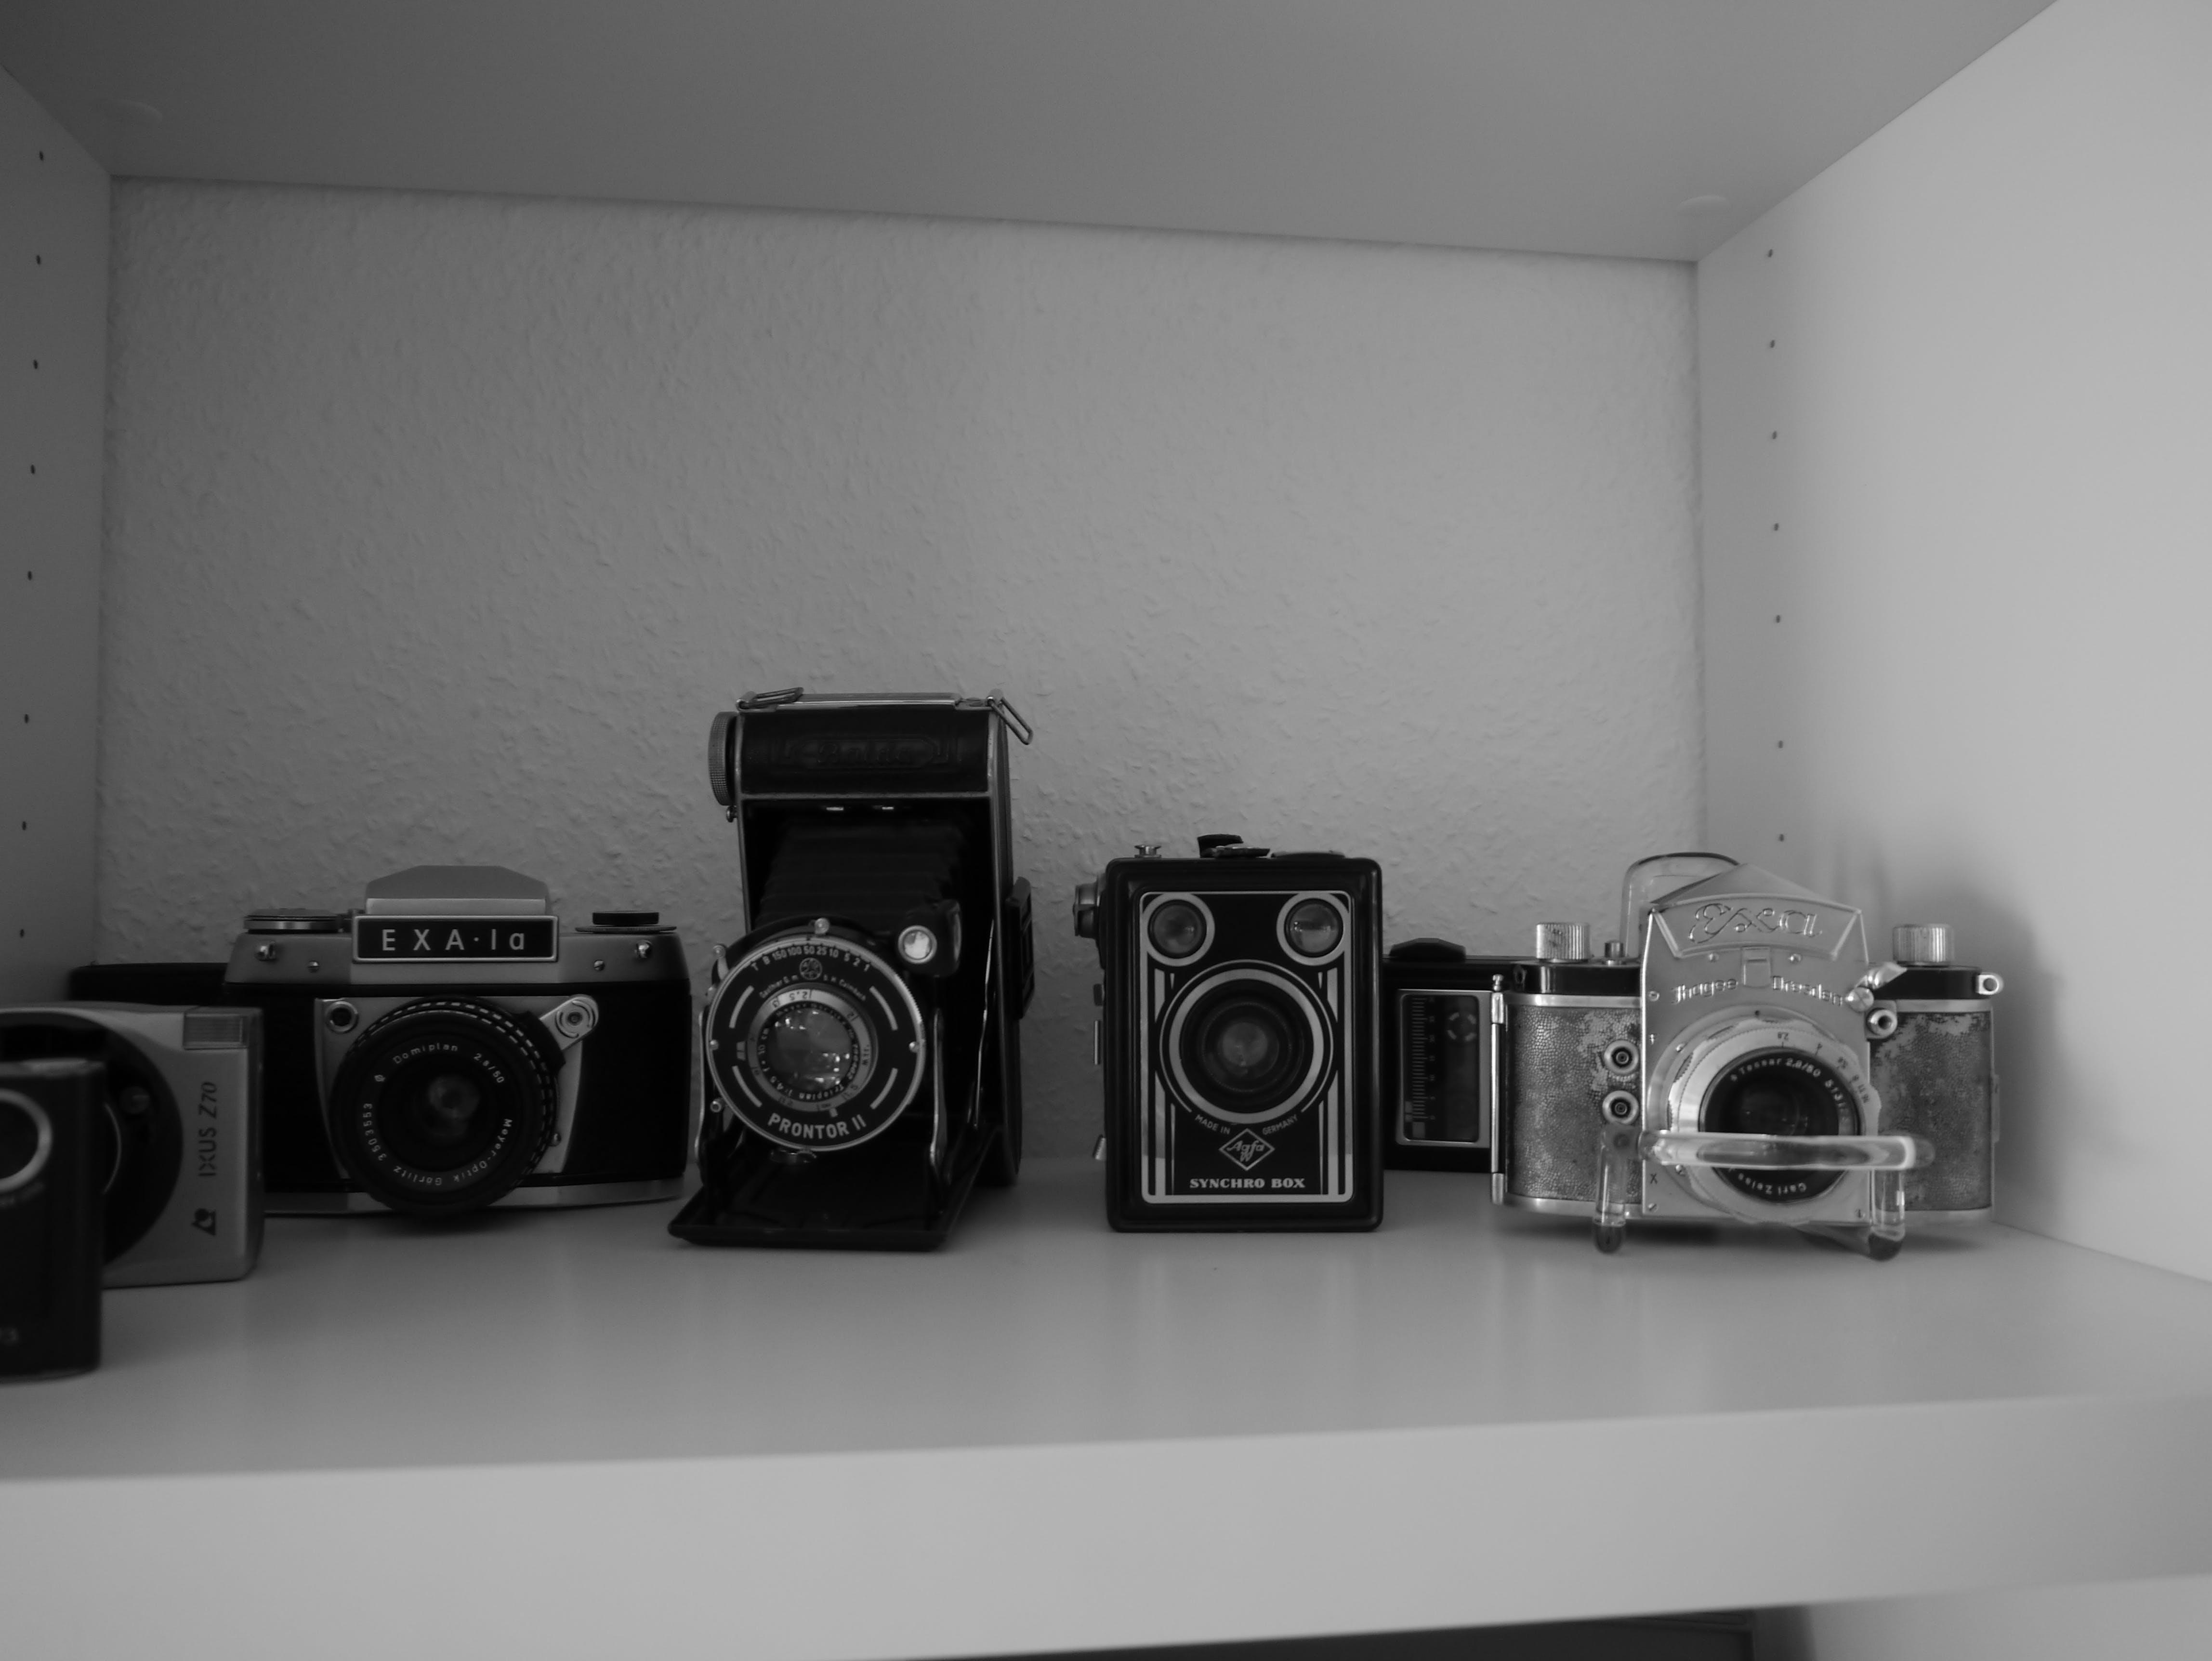 aperture, black and white, brand trademark